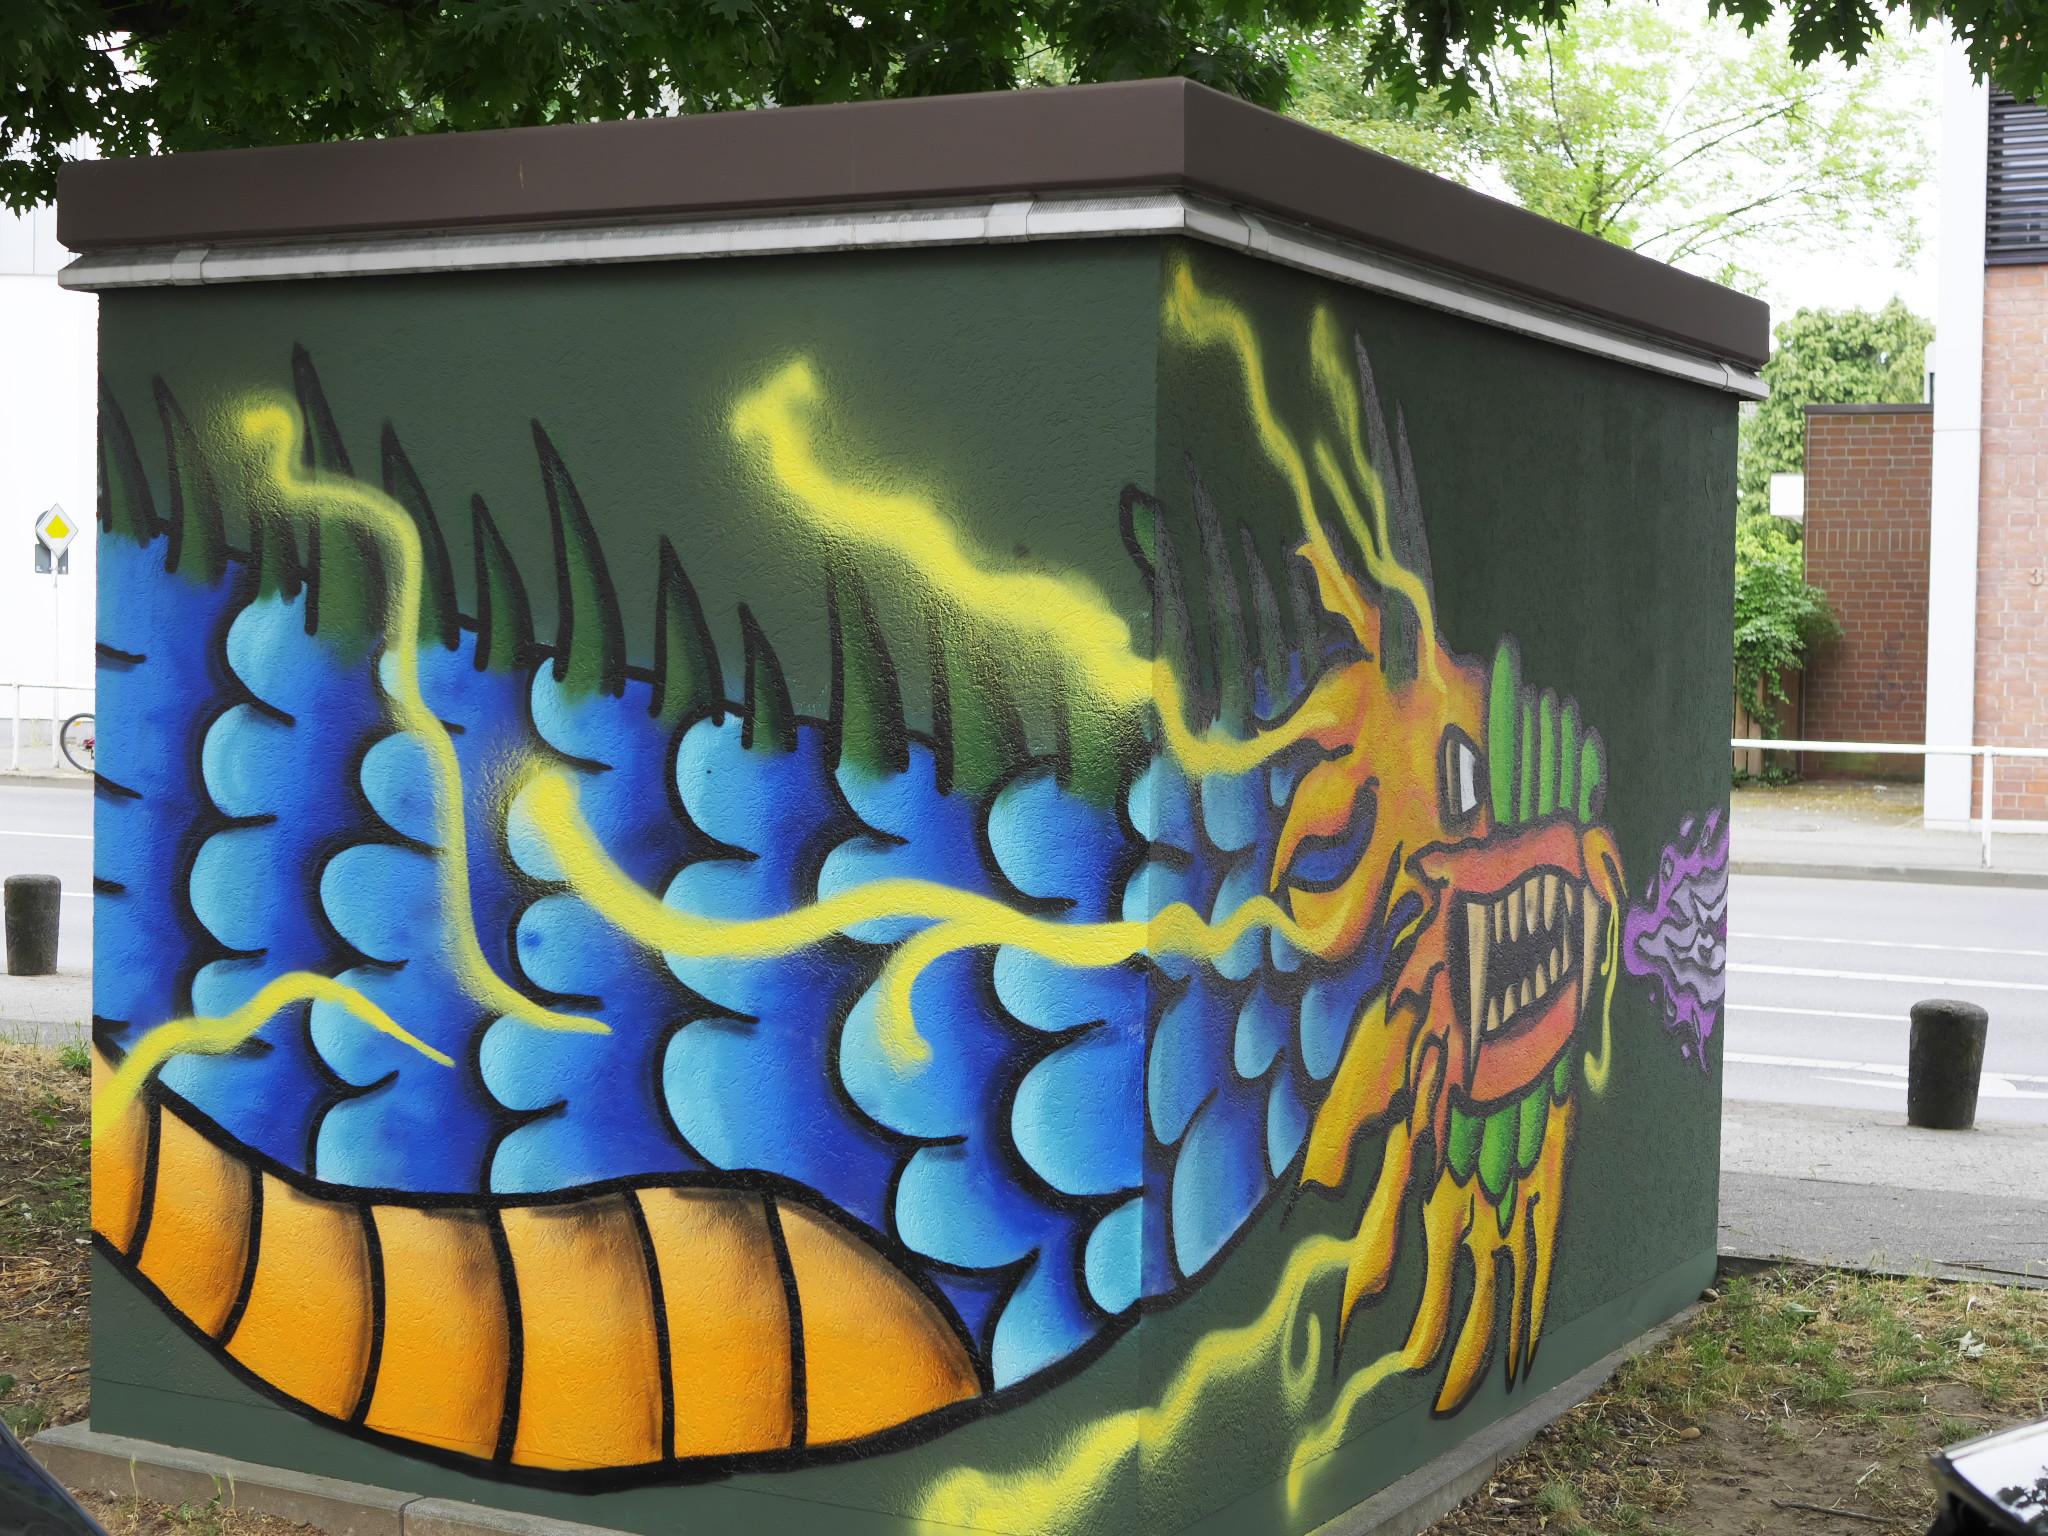 jugendkulturjahr-2020-ratingen-Grafitti-drache03